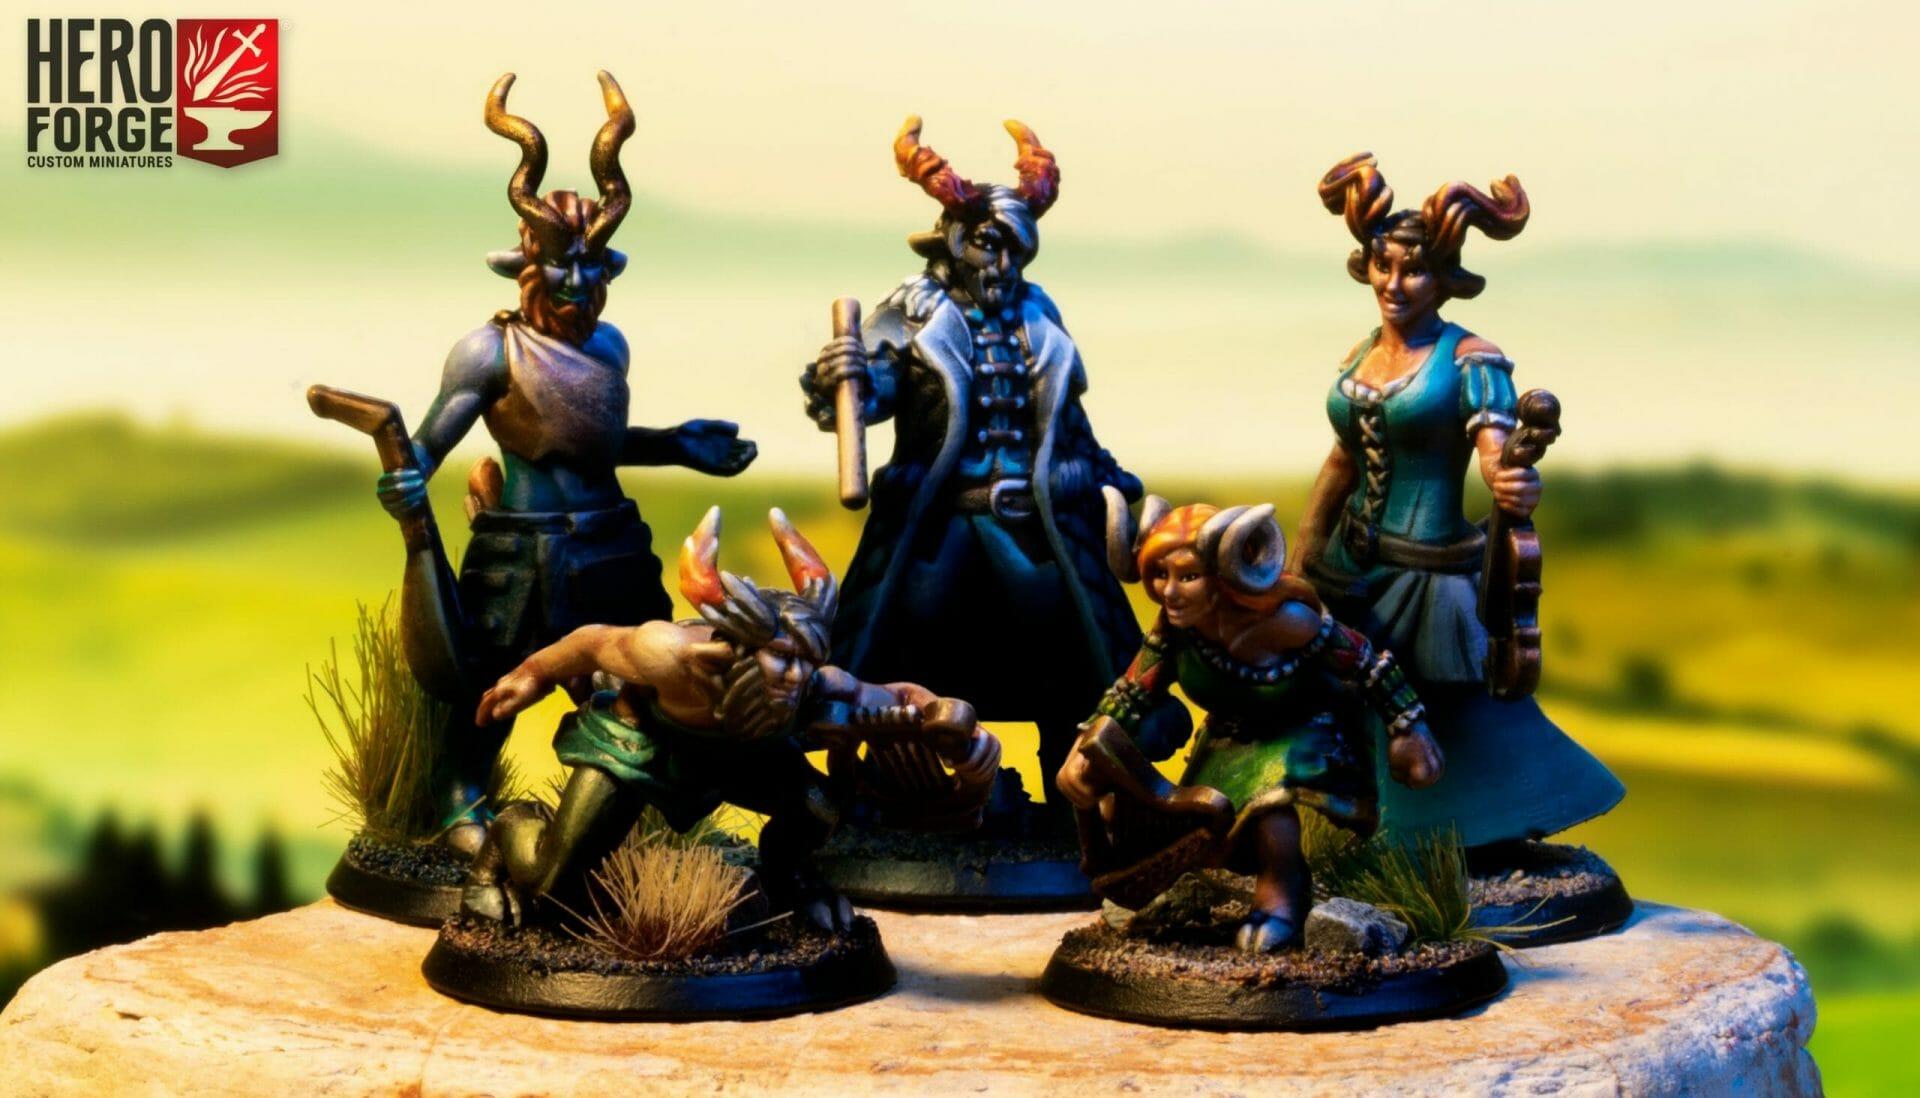 Hero Forge horns